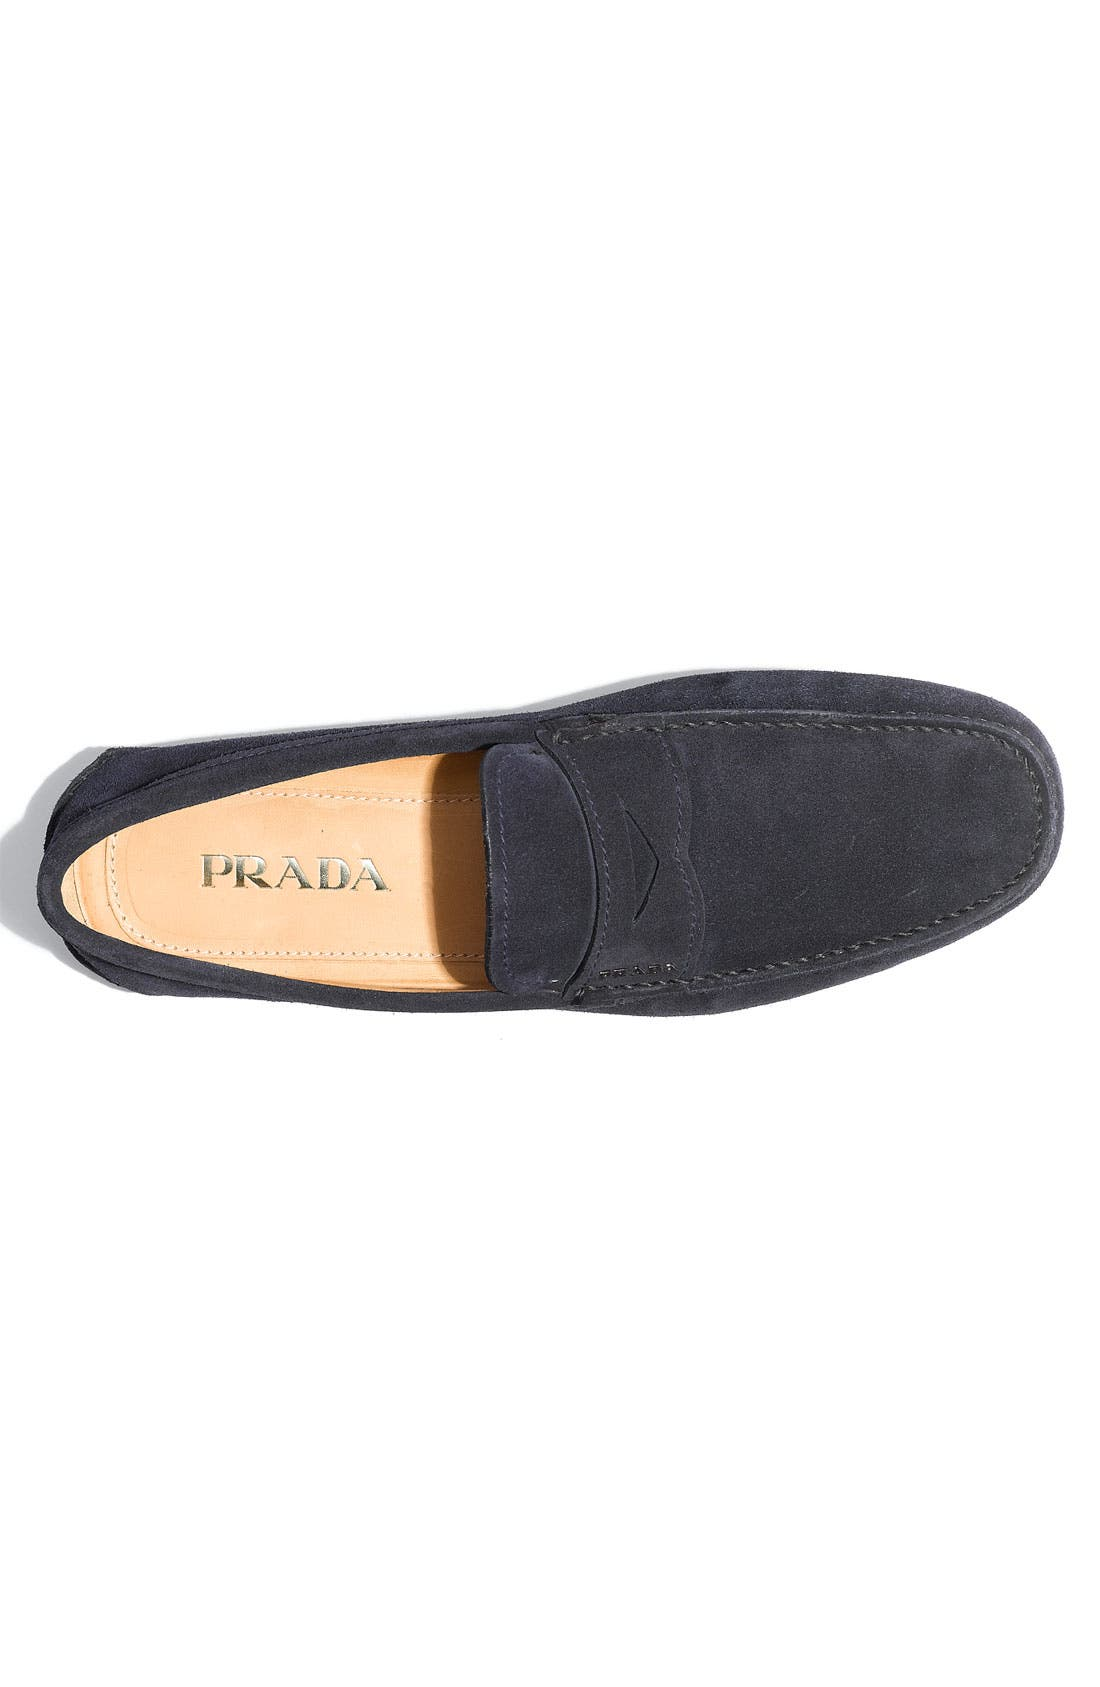 Alternate Image 3  - Prada Suede Penny Driving Shoe (Men)